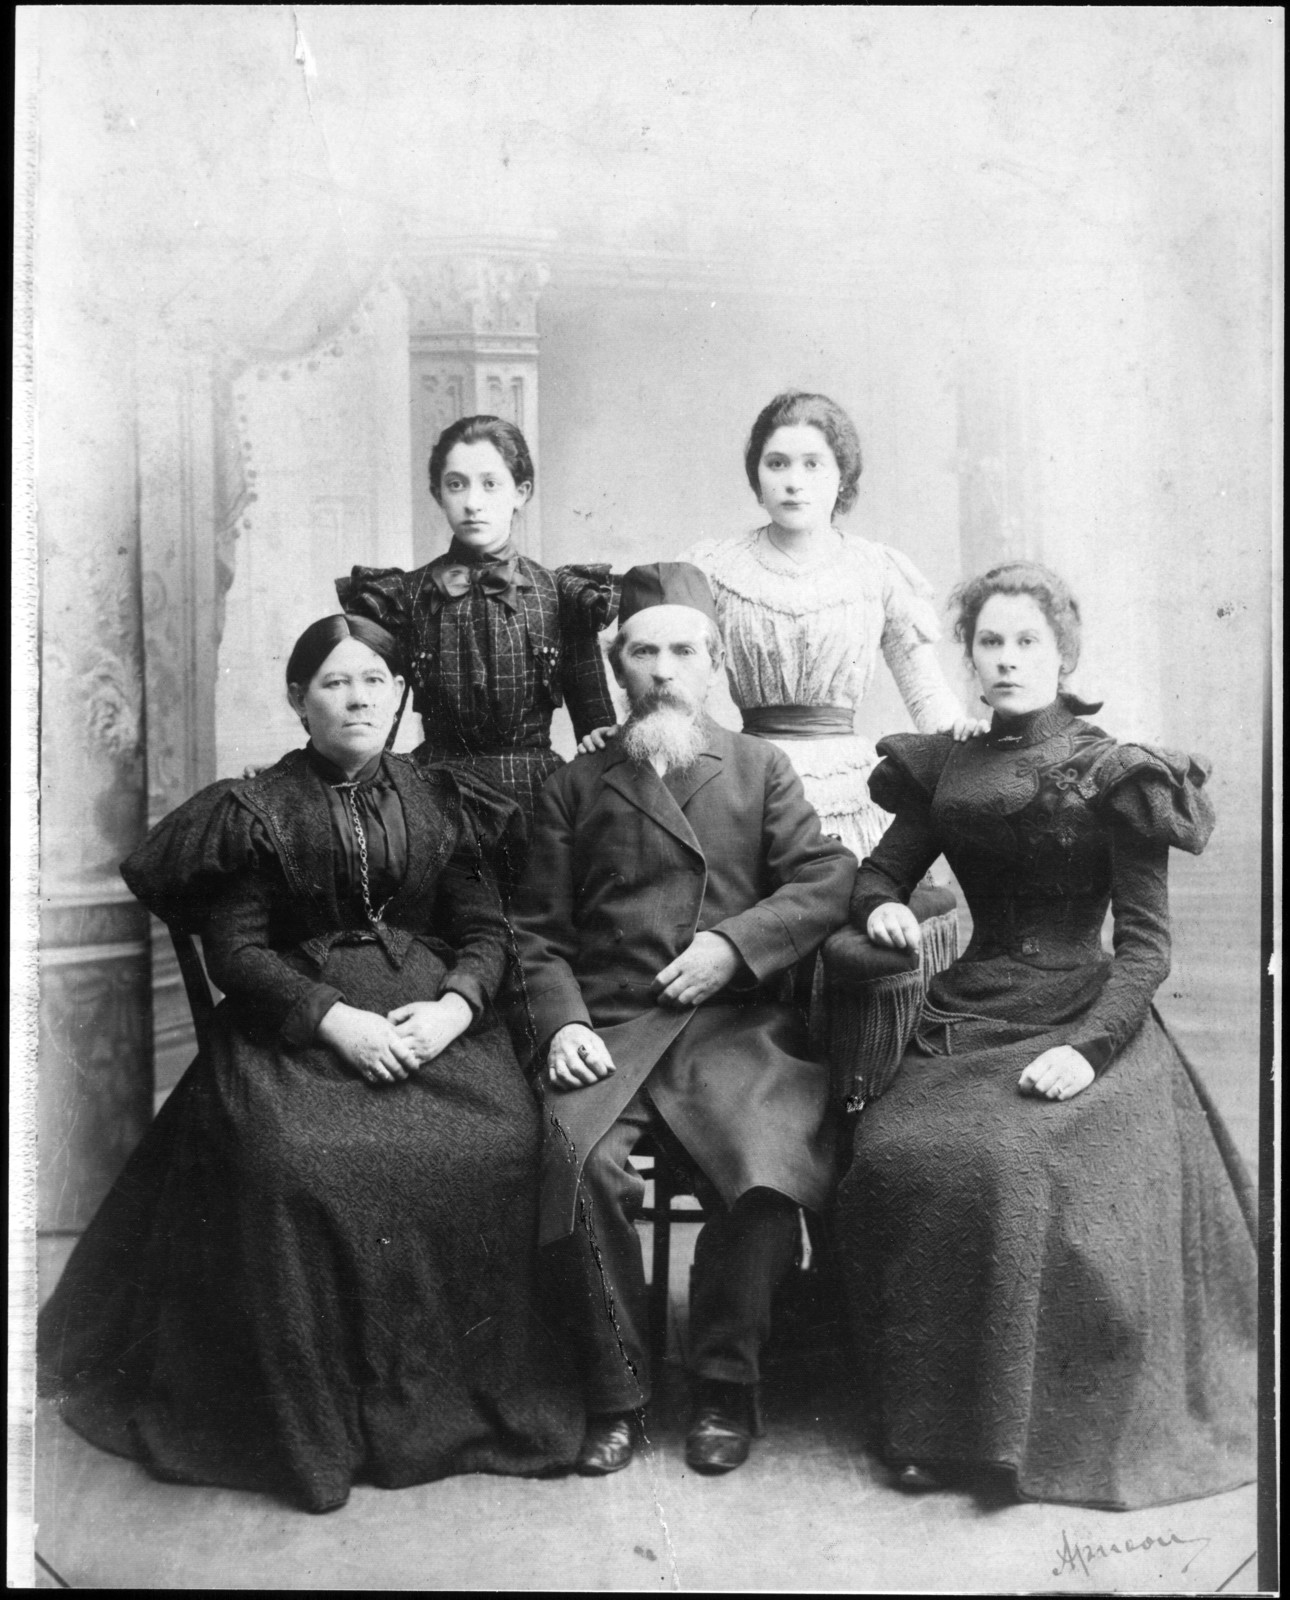 Aaron Copland's paternal grandparents, 1899